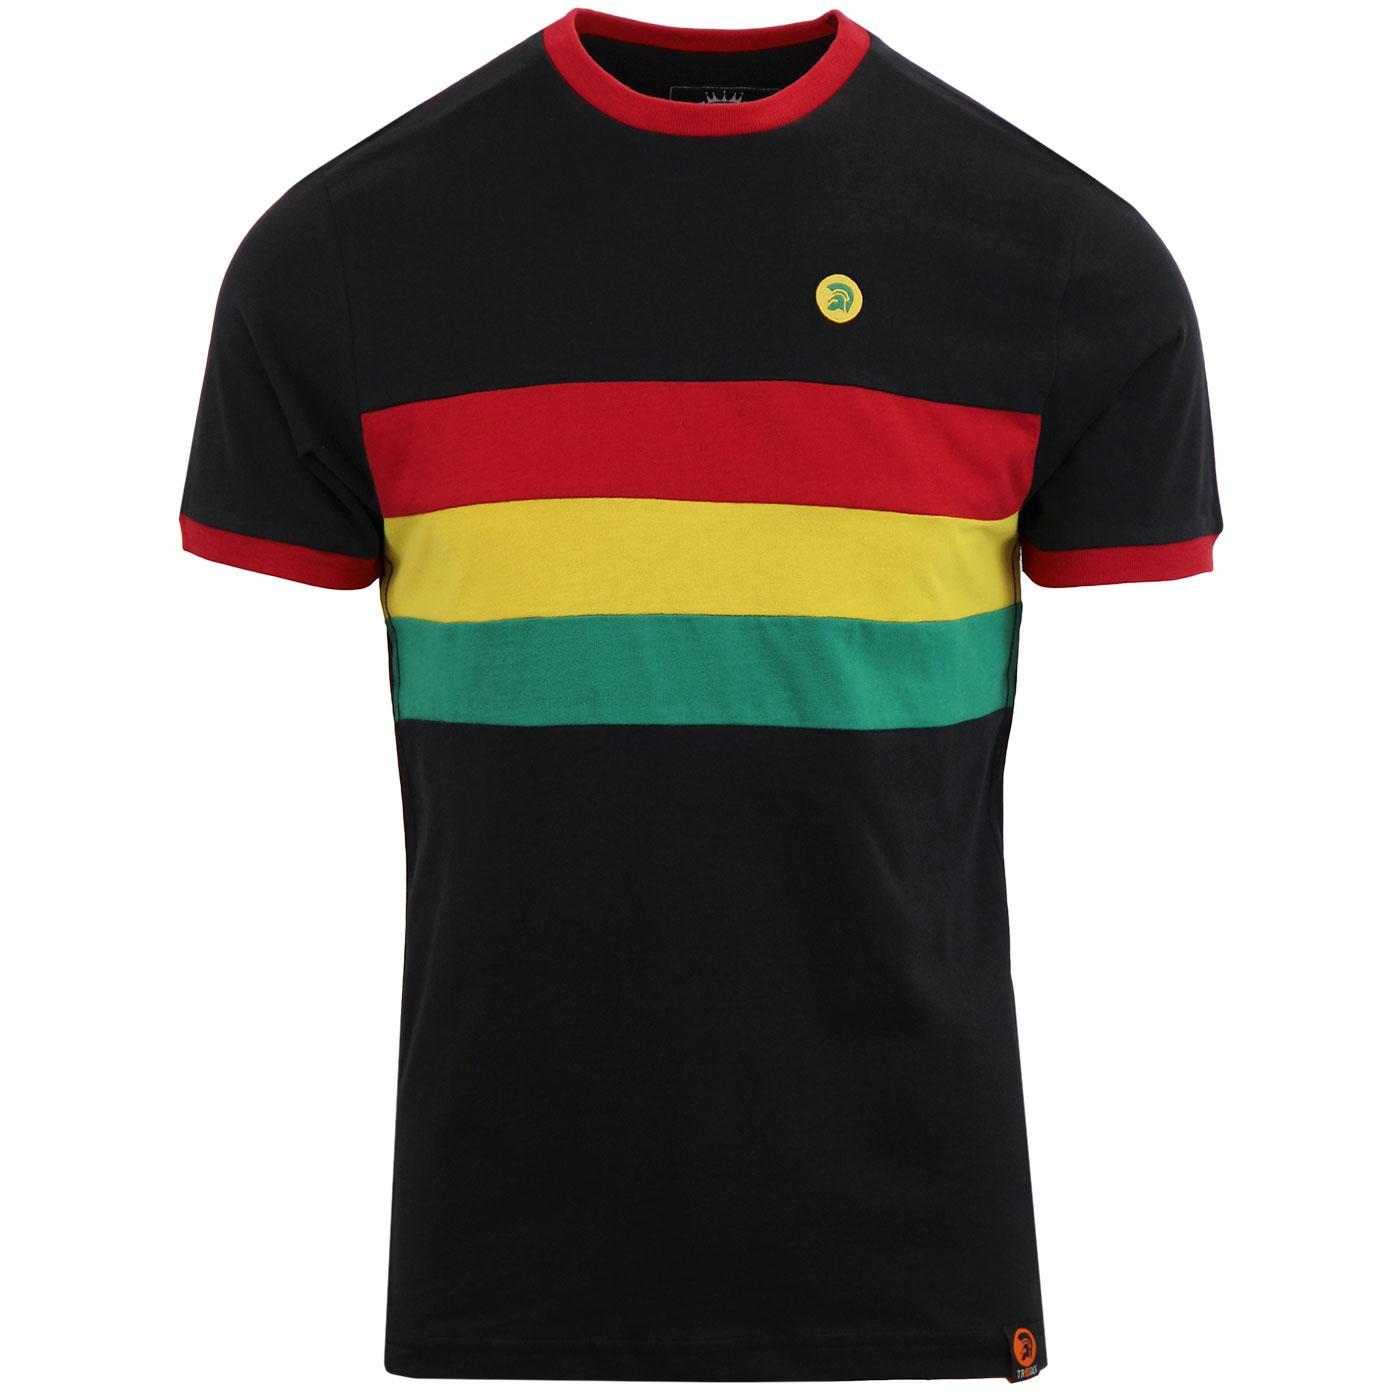 TROJAN RECORDS Mod Ska Rasta Stripe Ringer T-Shirt